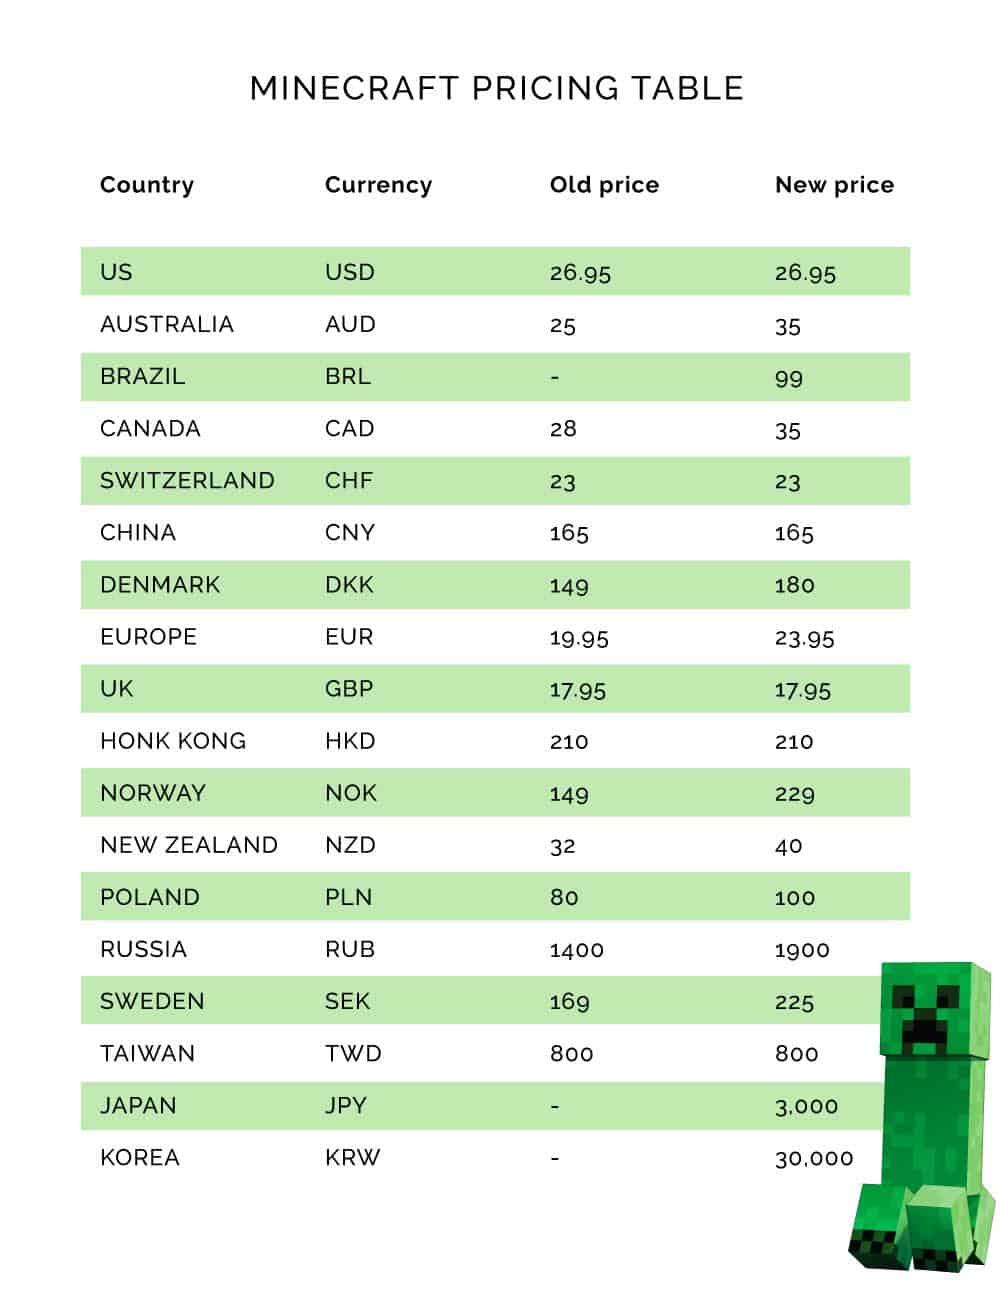 Minecraft price increases around the world